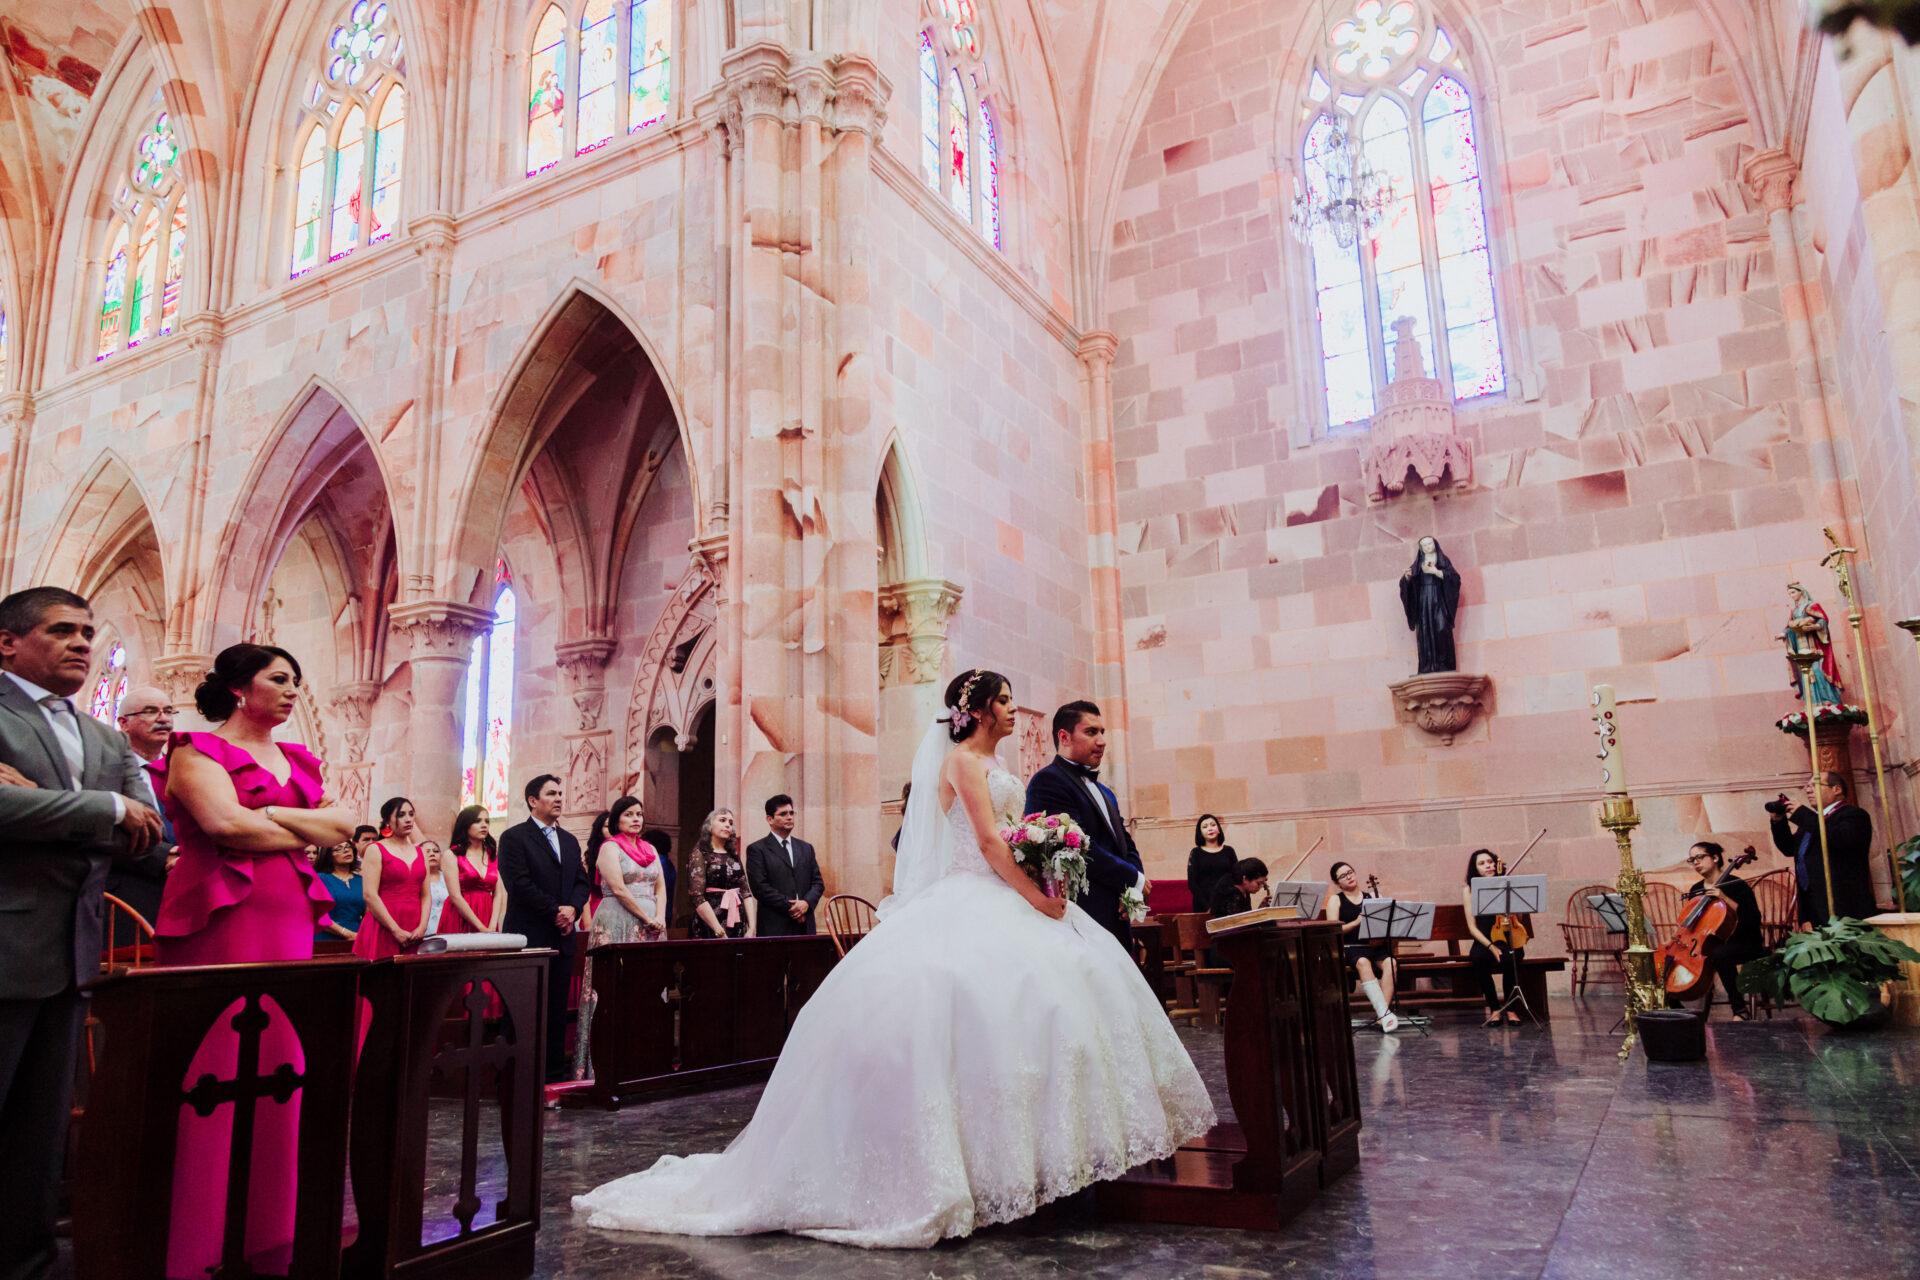 javier_noriega_fotografo_bodas_exhacienda_las_mercedes_zacatecas_wedding_photographer3a